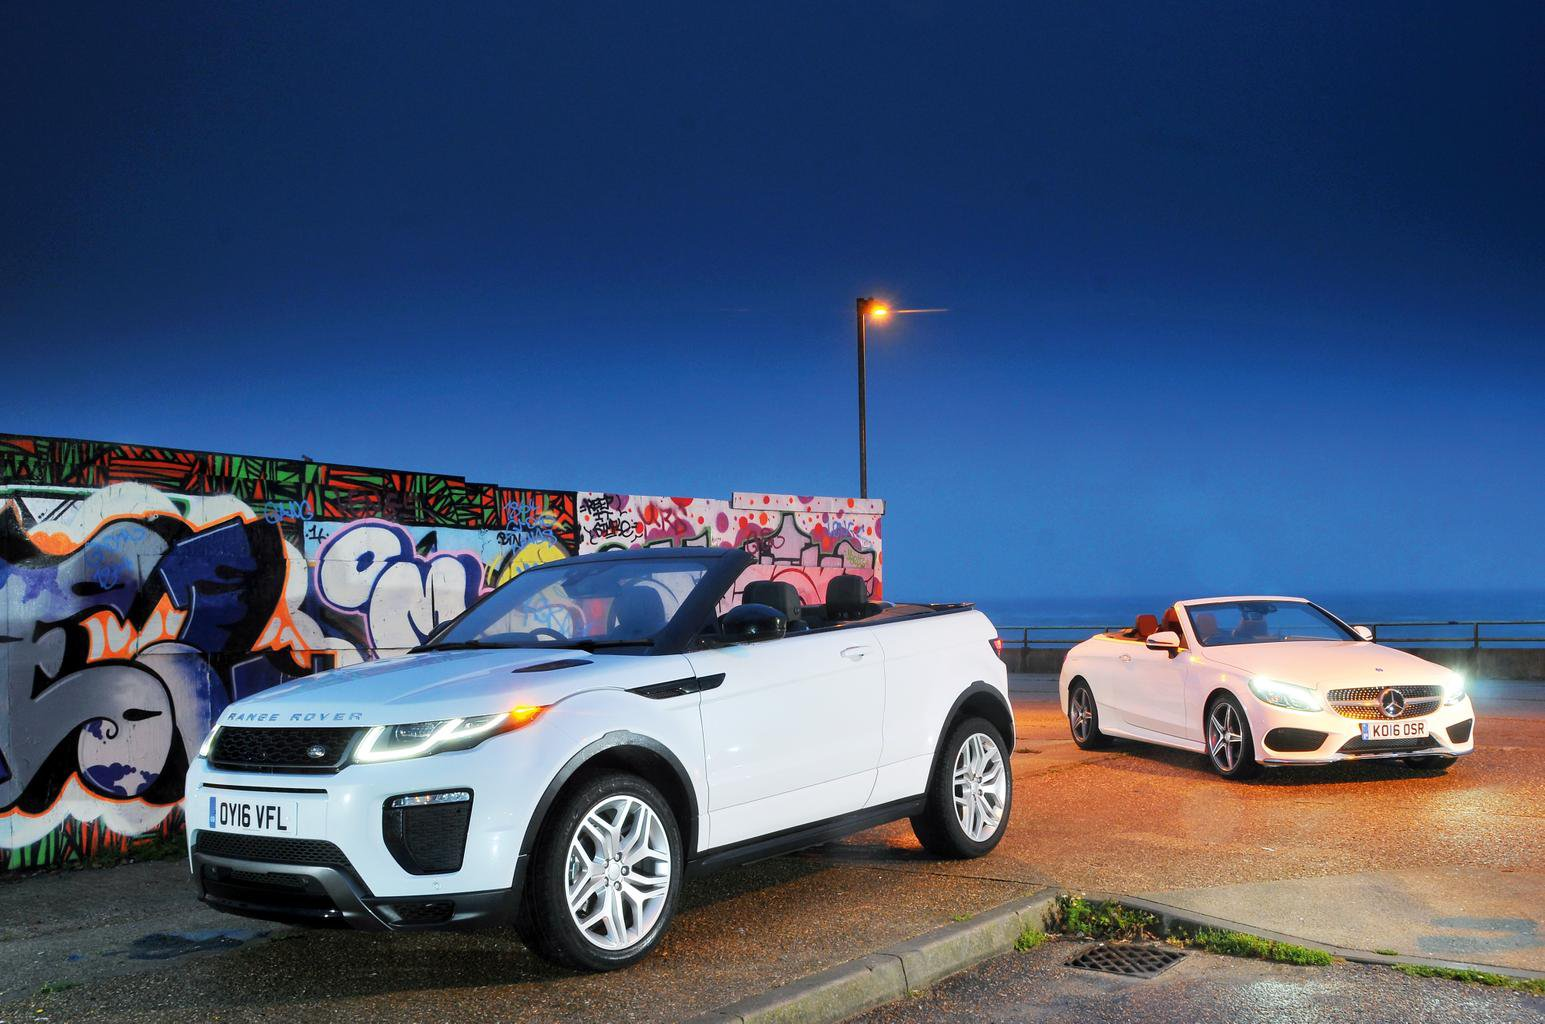 Range Rover Evoque Convertible vs Mercedes C-Class Cabriolet